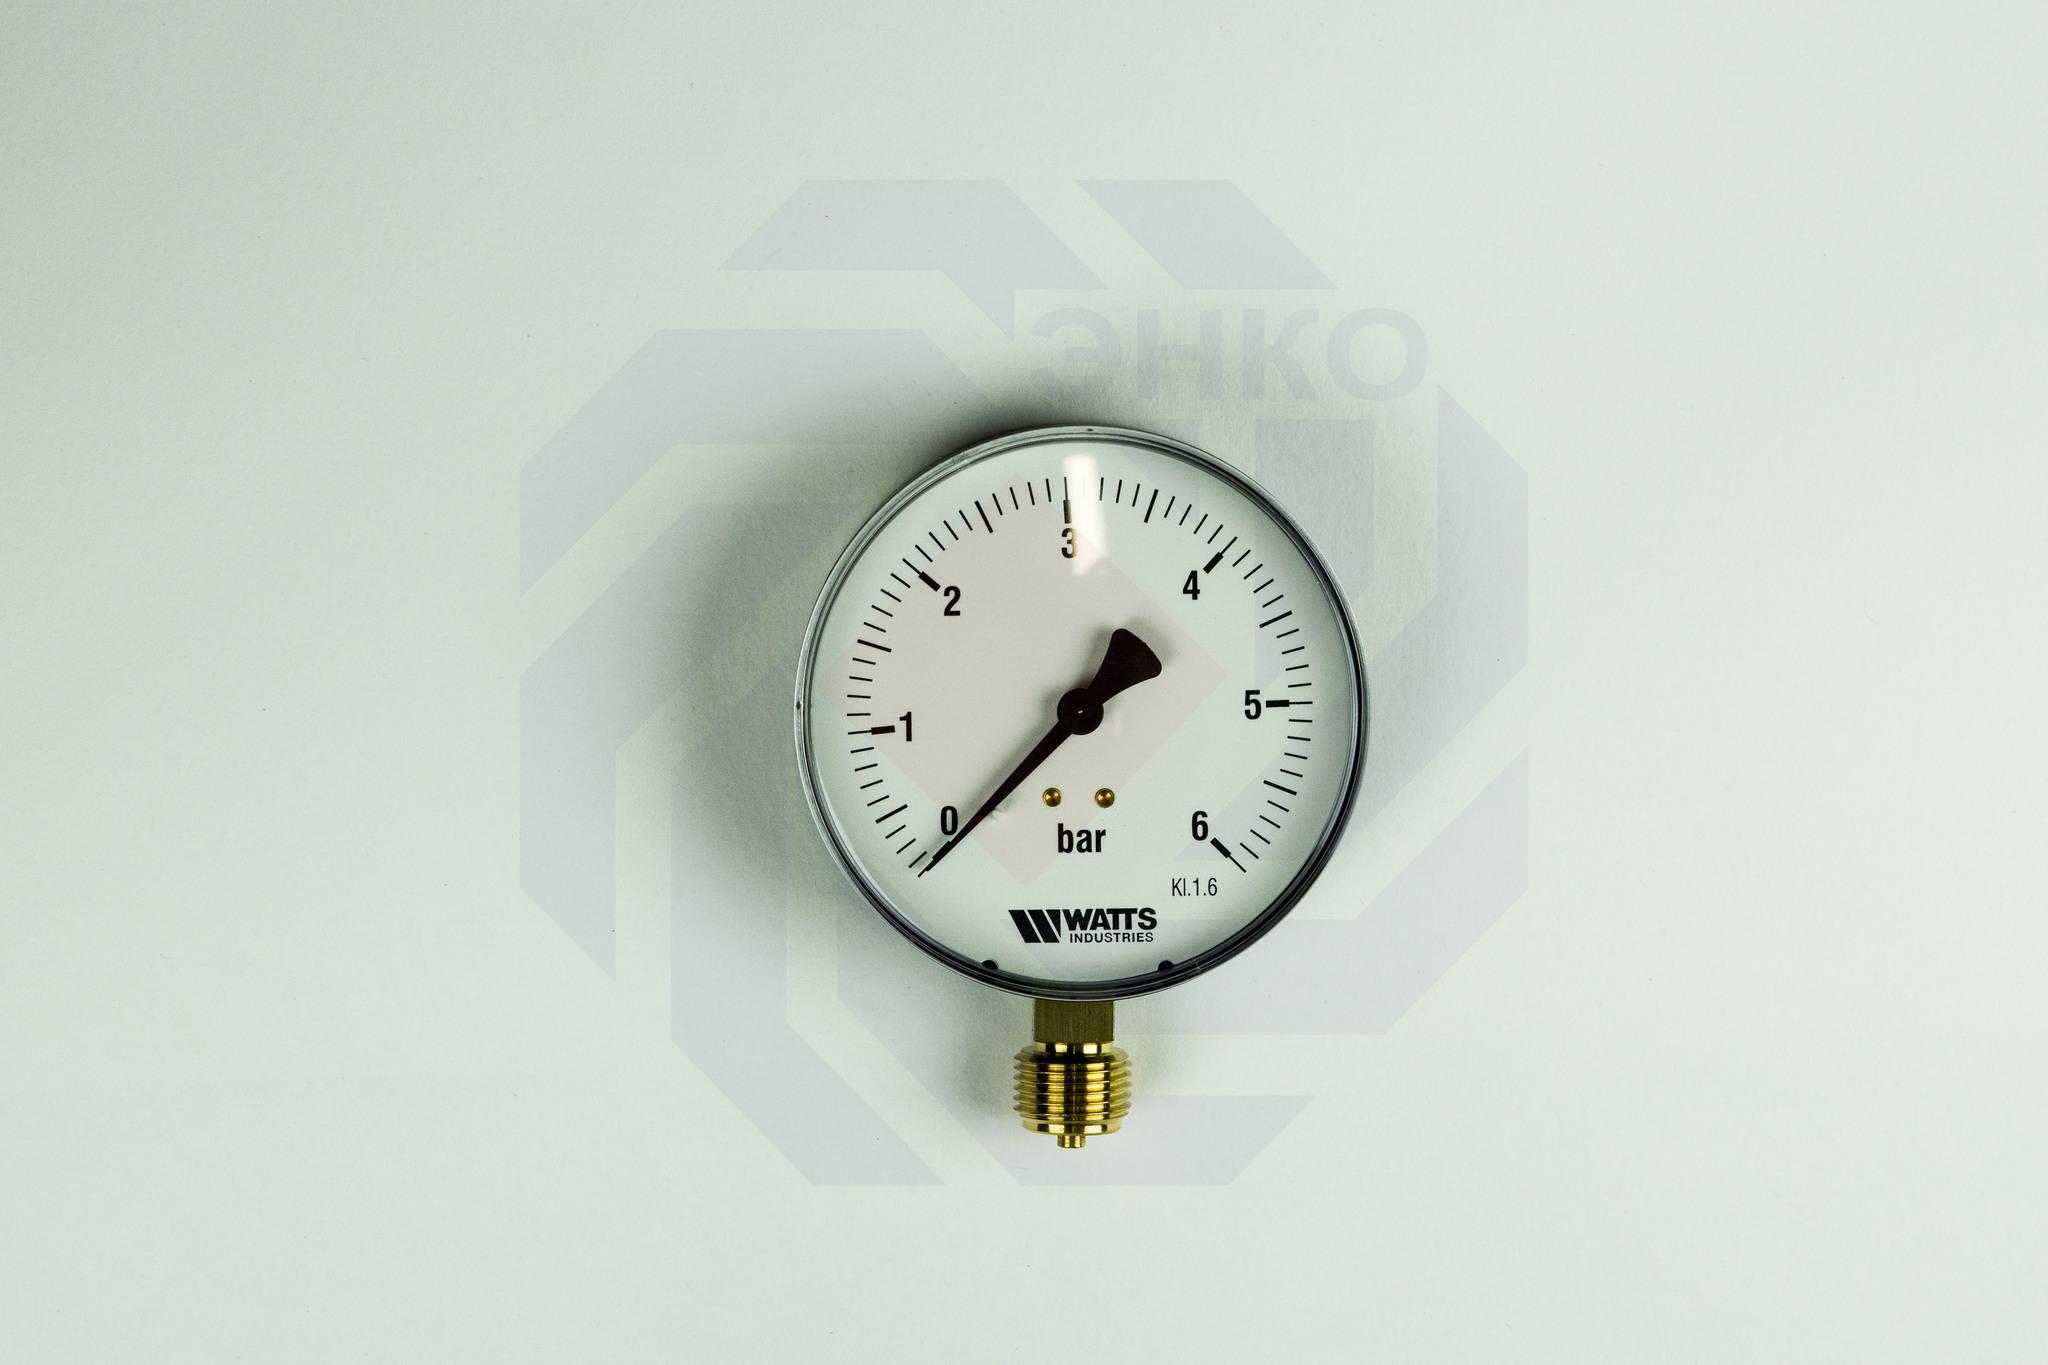 Манометр радиальный WATTS MDR 100/6 (F+R250) 0-6 бар 100 мм ½